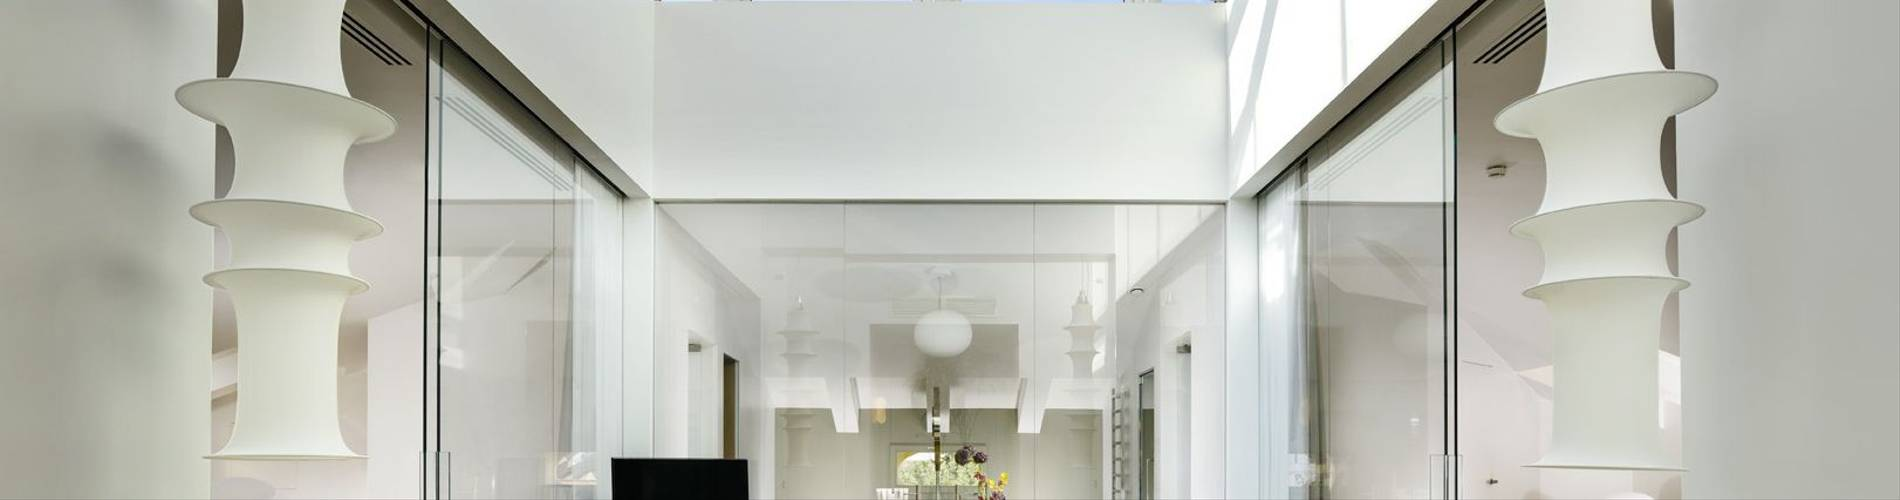 407 skylight.jpg